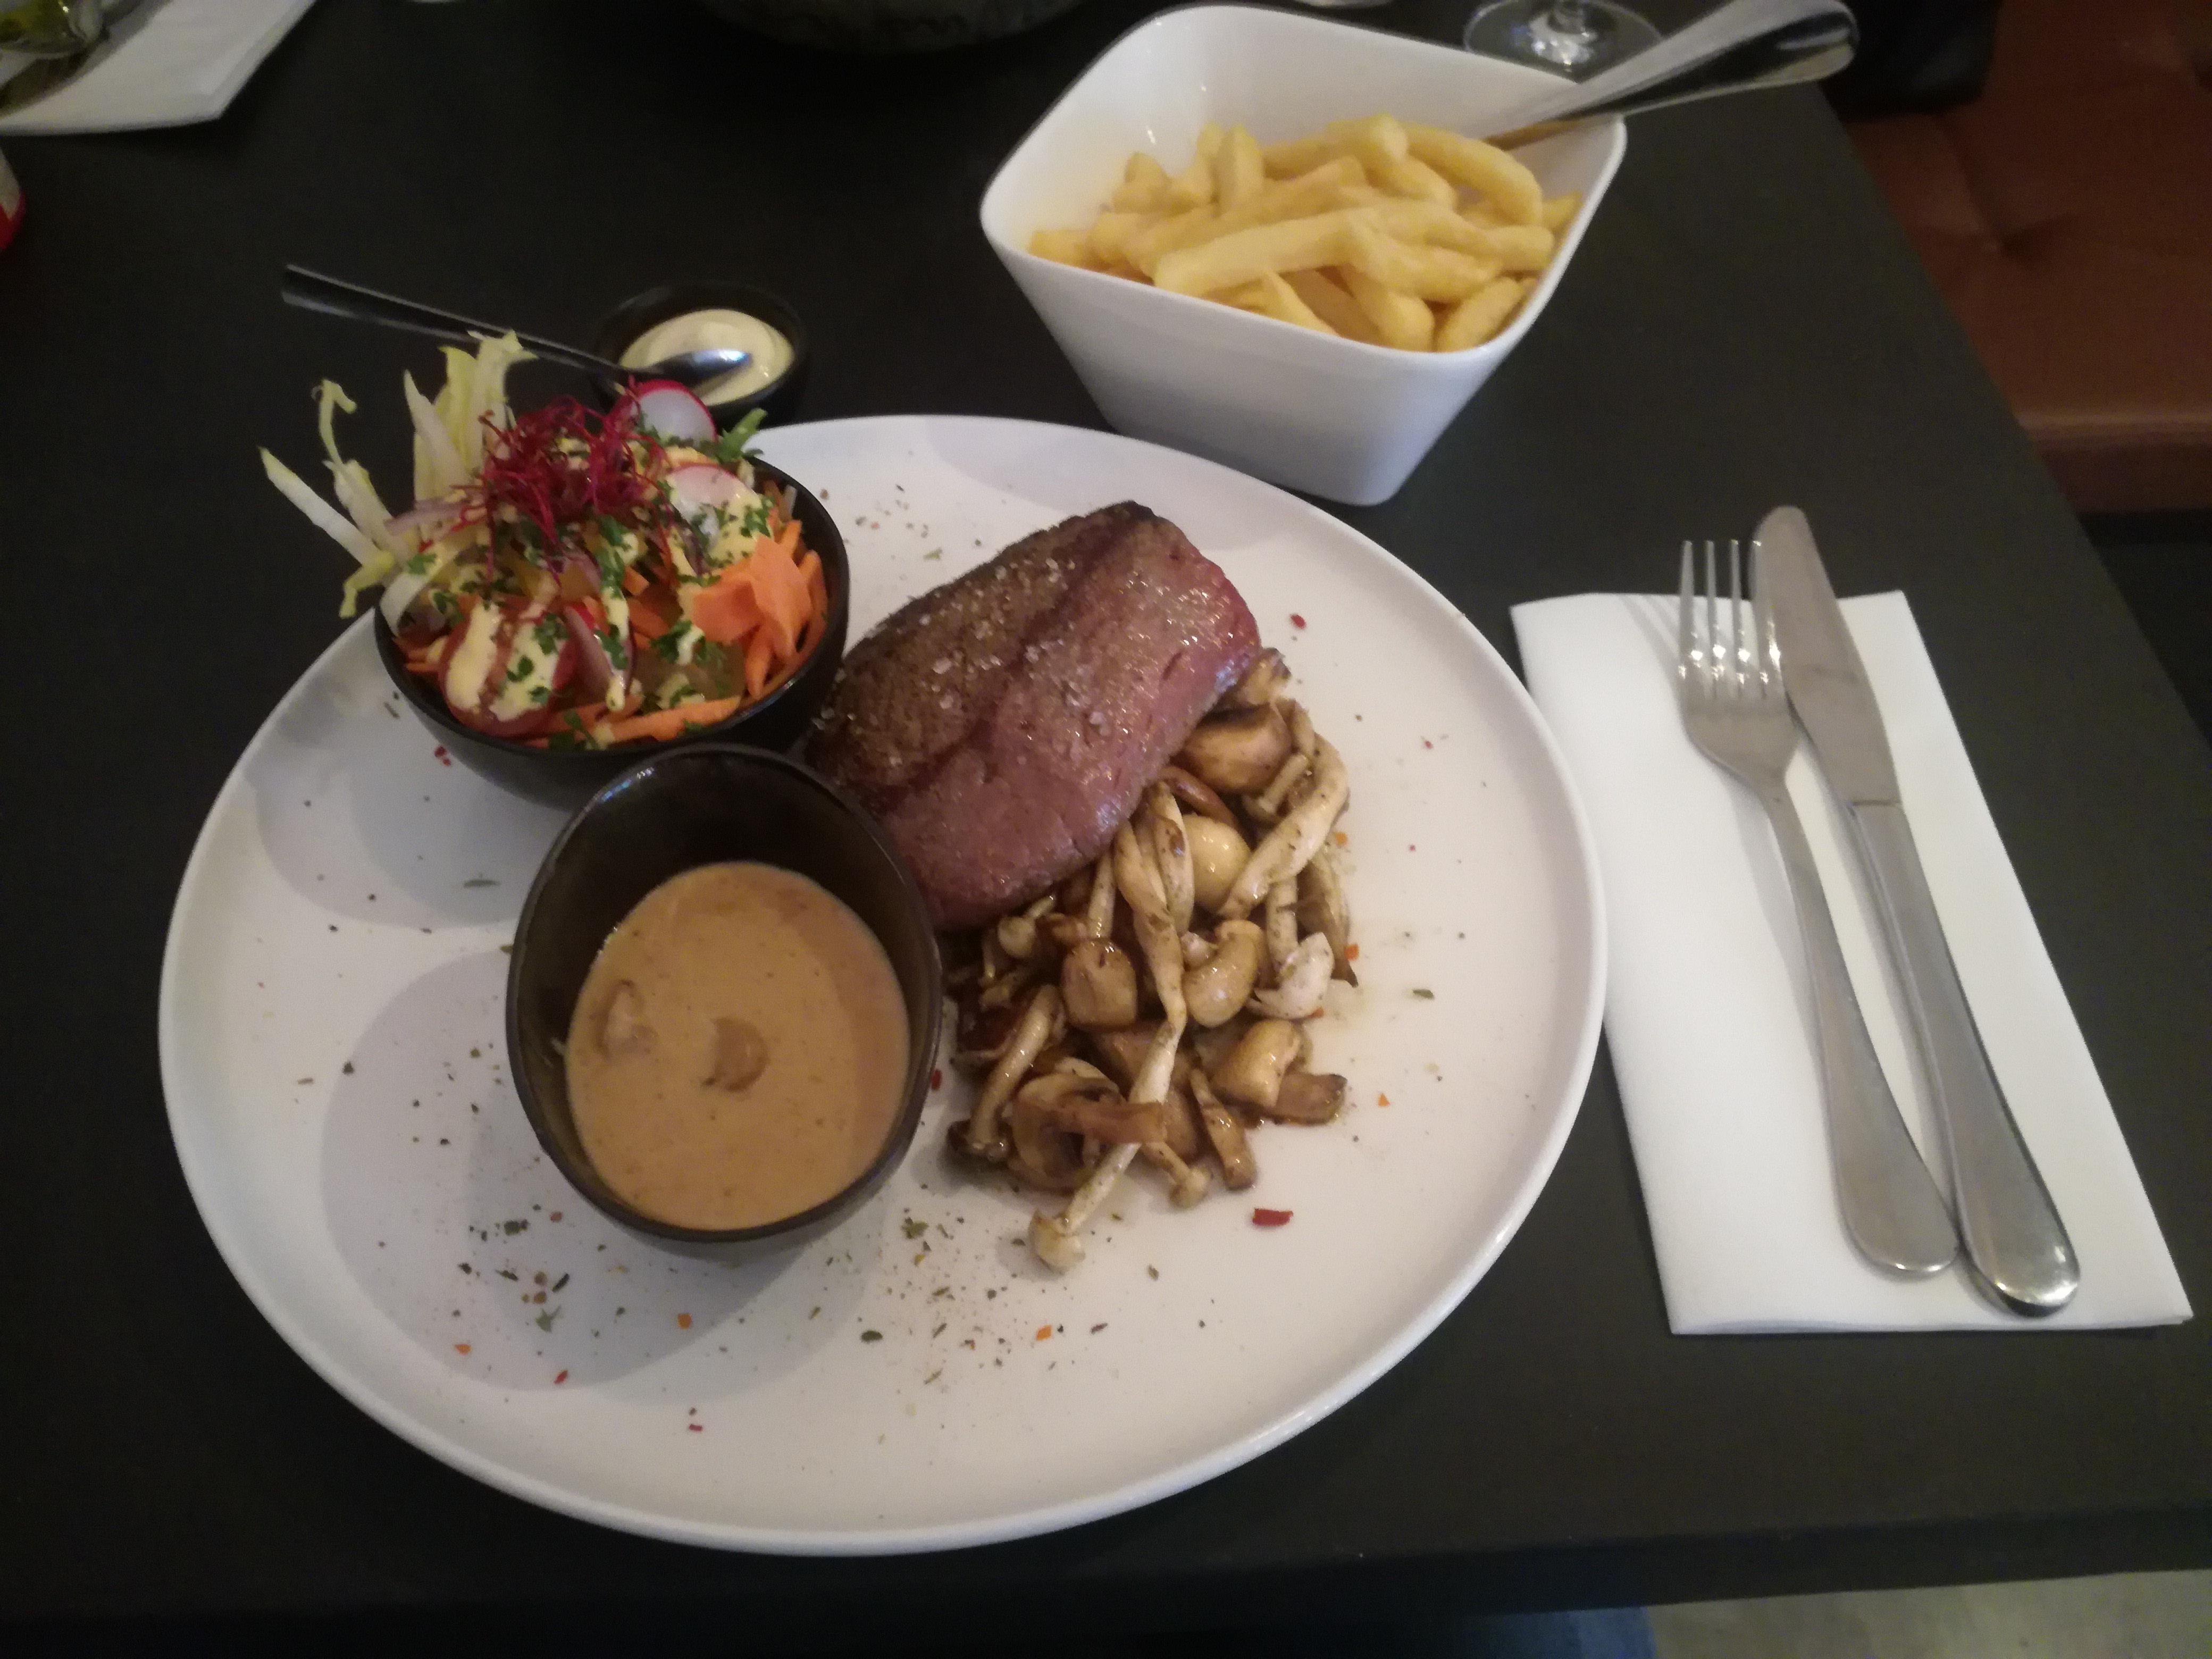 beste steak van belgie ploatse 6